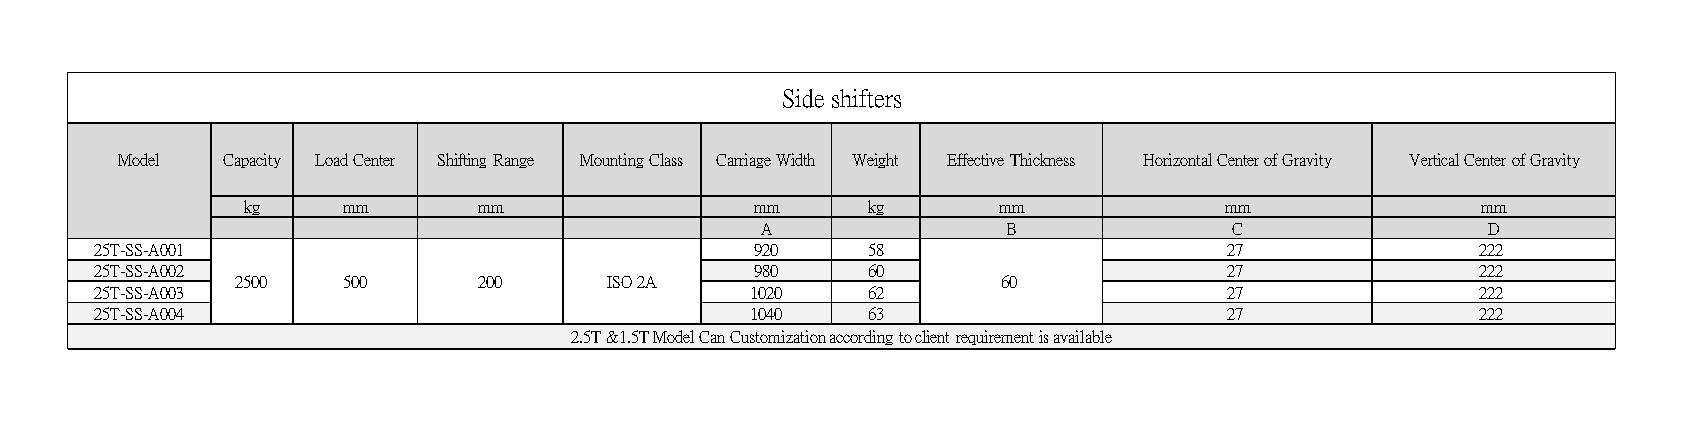 Axon Forklift: sideshifters Standard